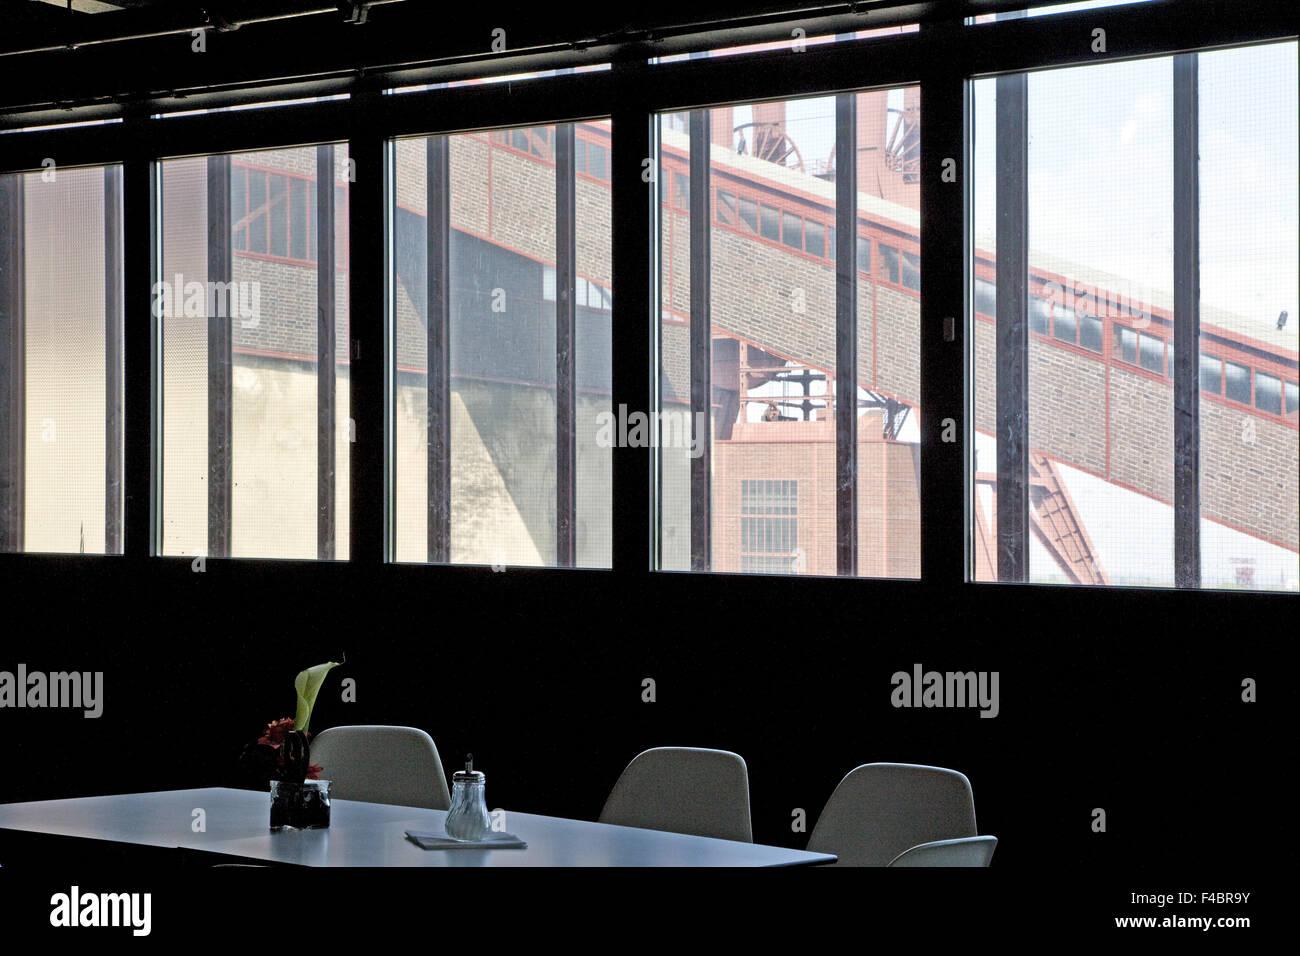 Zollverein, Essen, Germany - Stock Image